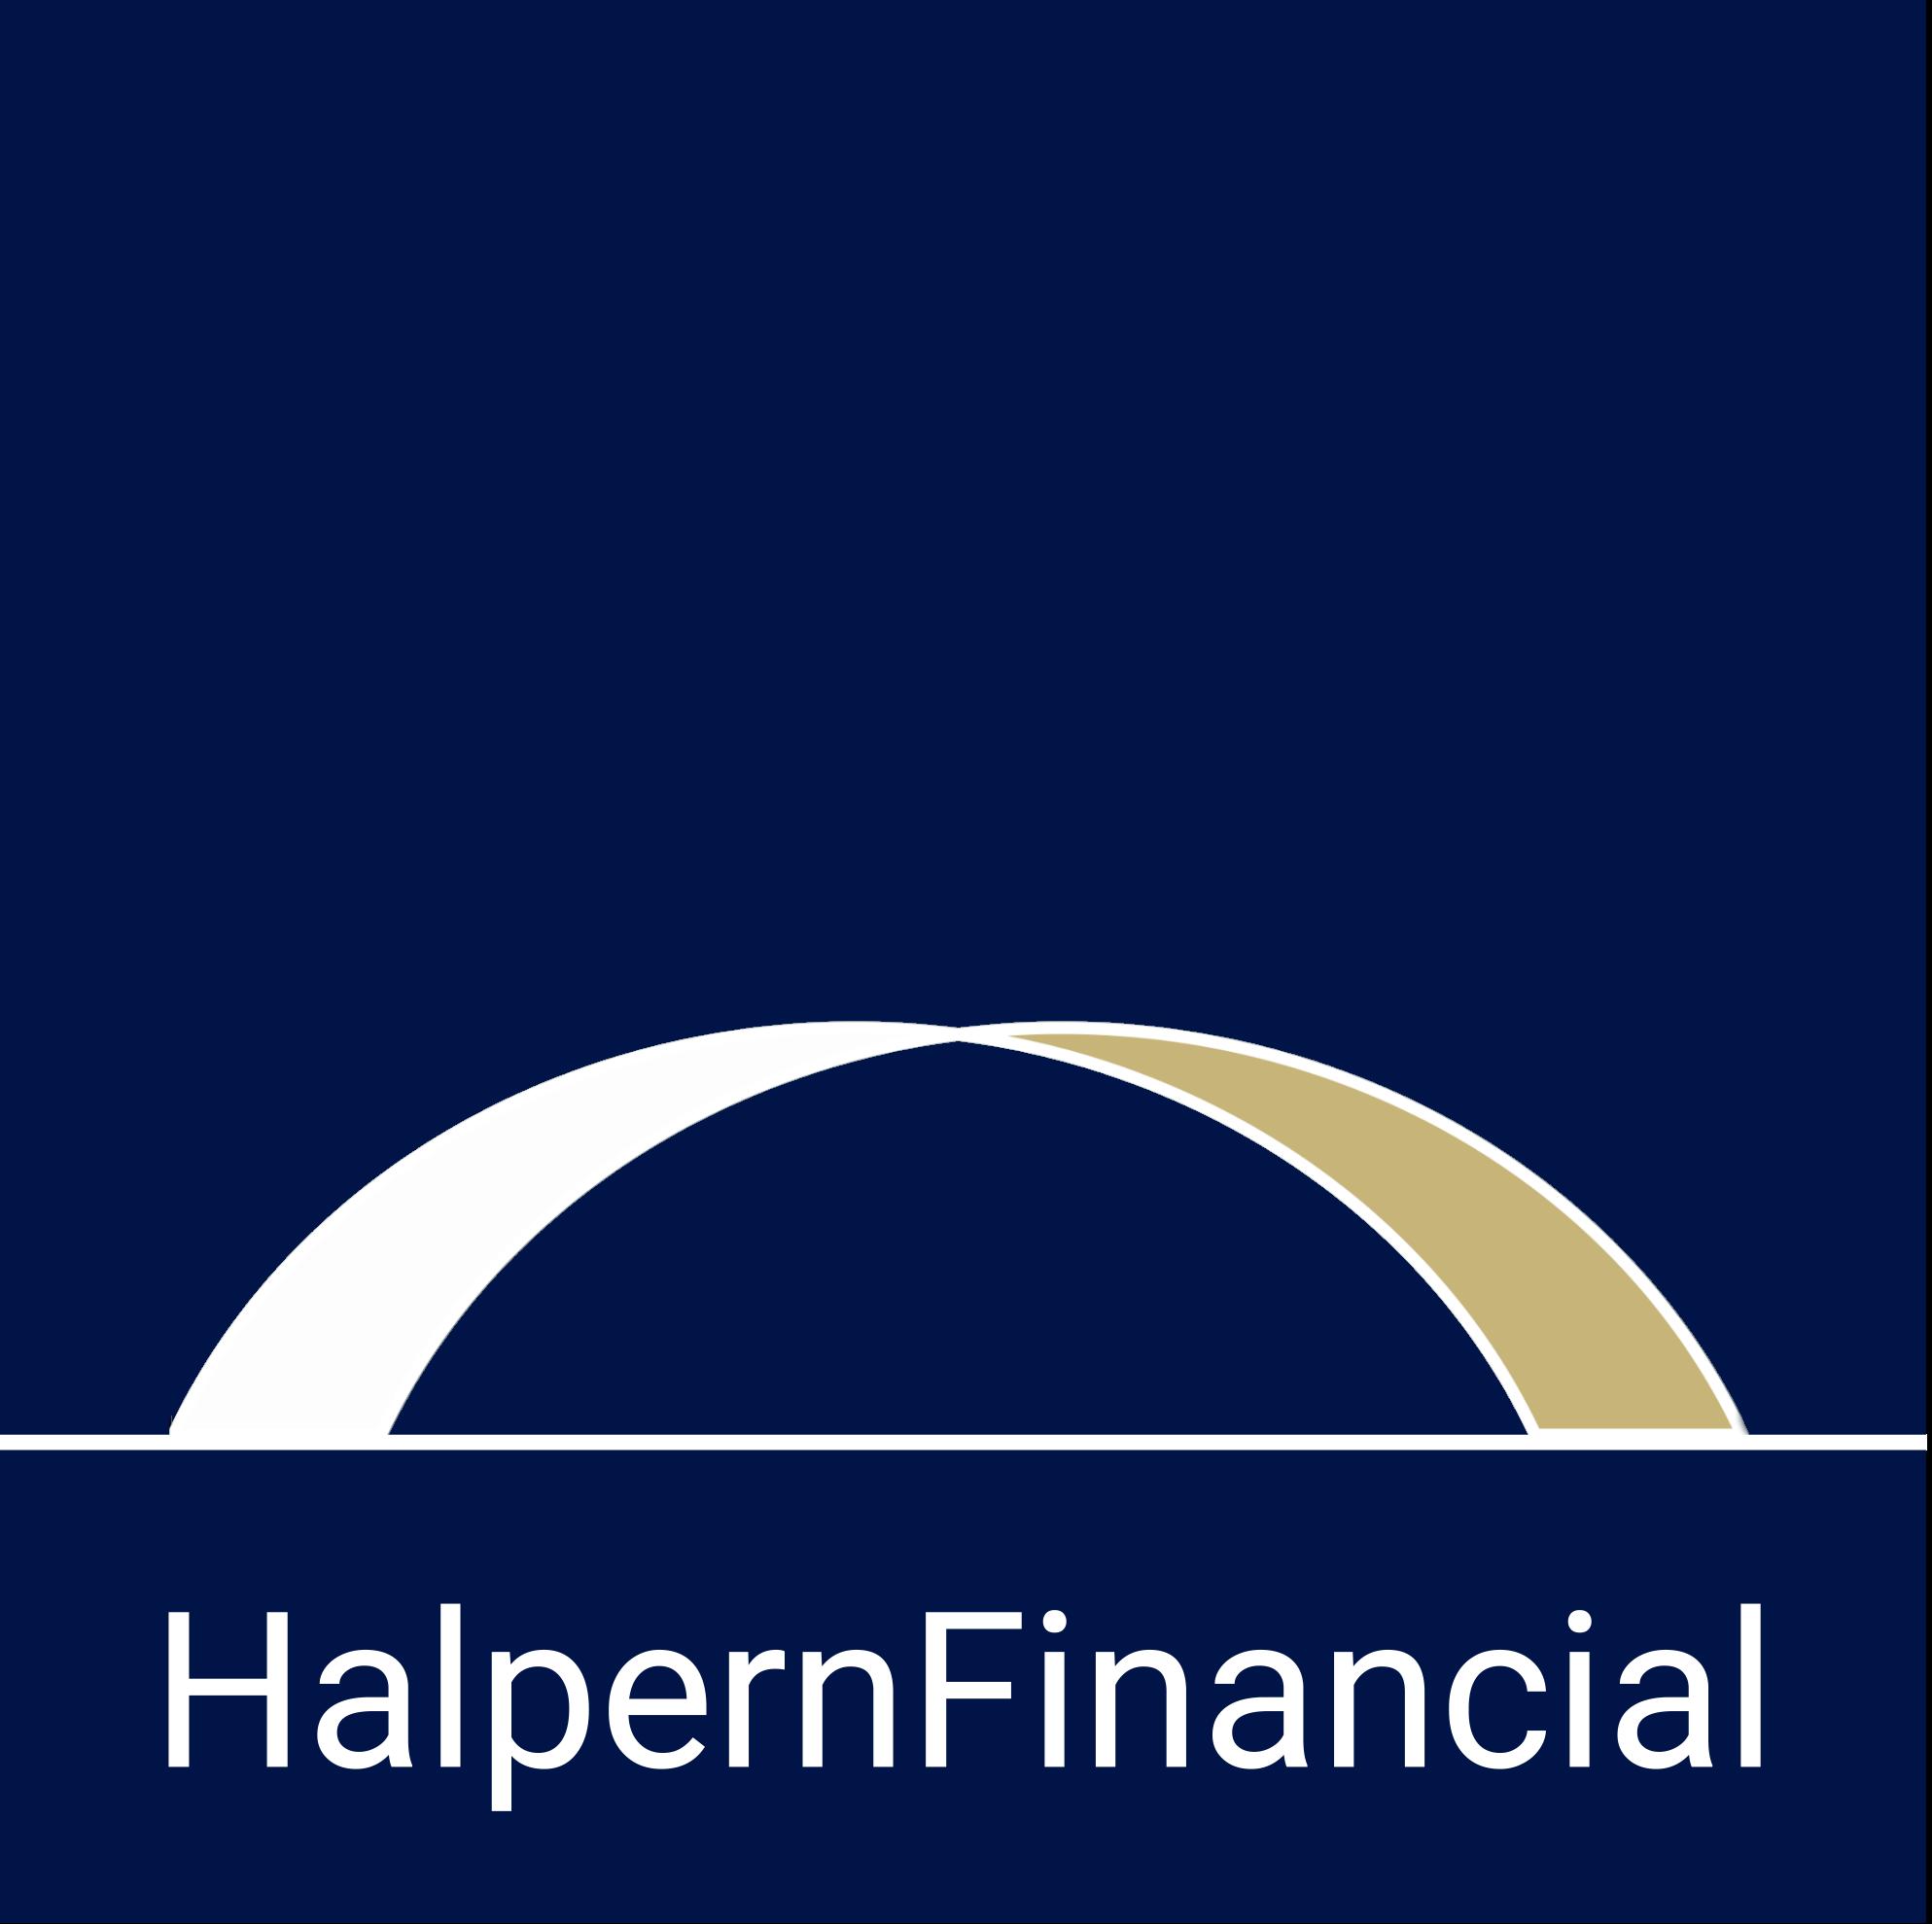 Halpern Financial Website Featured on Twenty over Ten Thumbnail